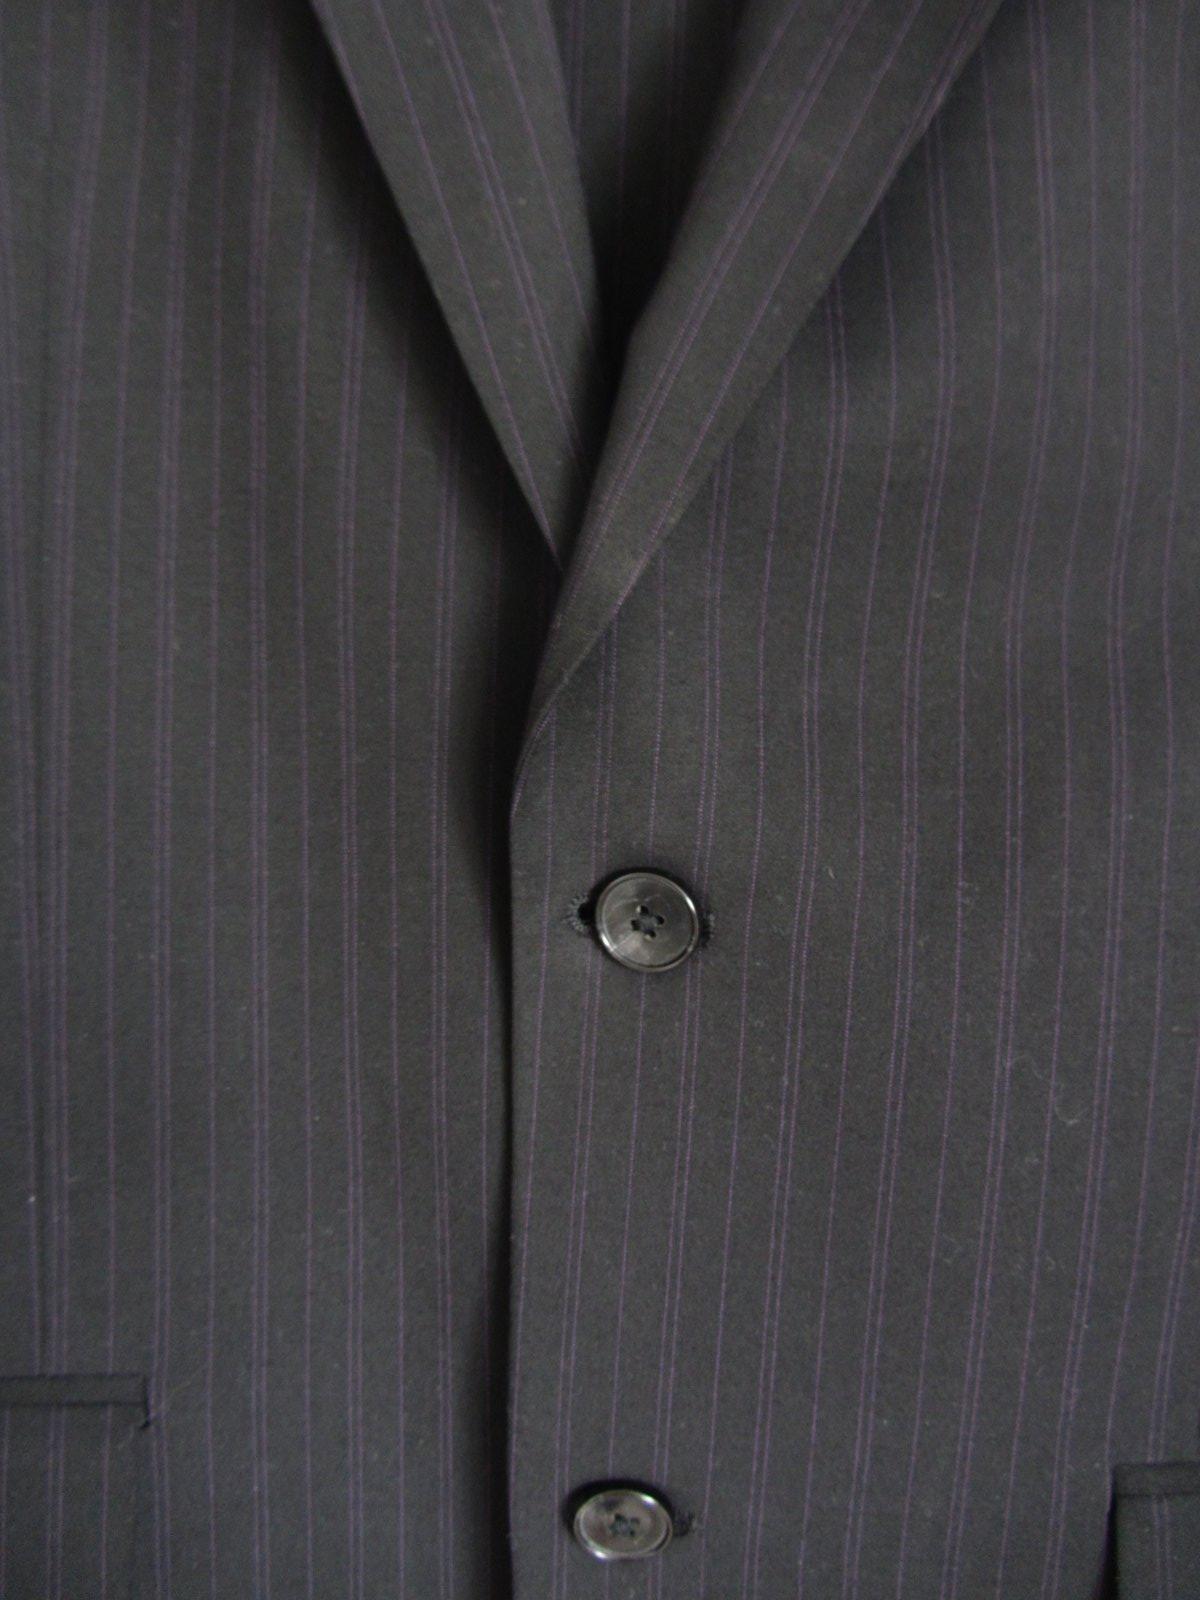 Pánsky oblek Mexx - Obrázok č. 3